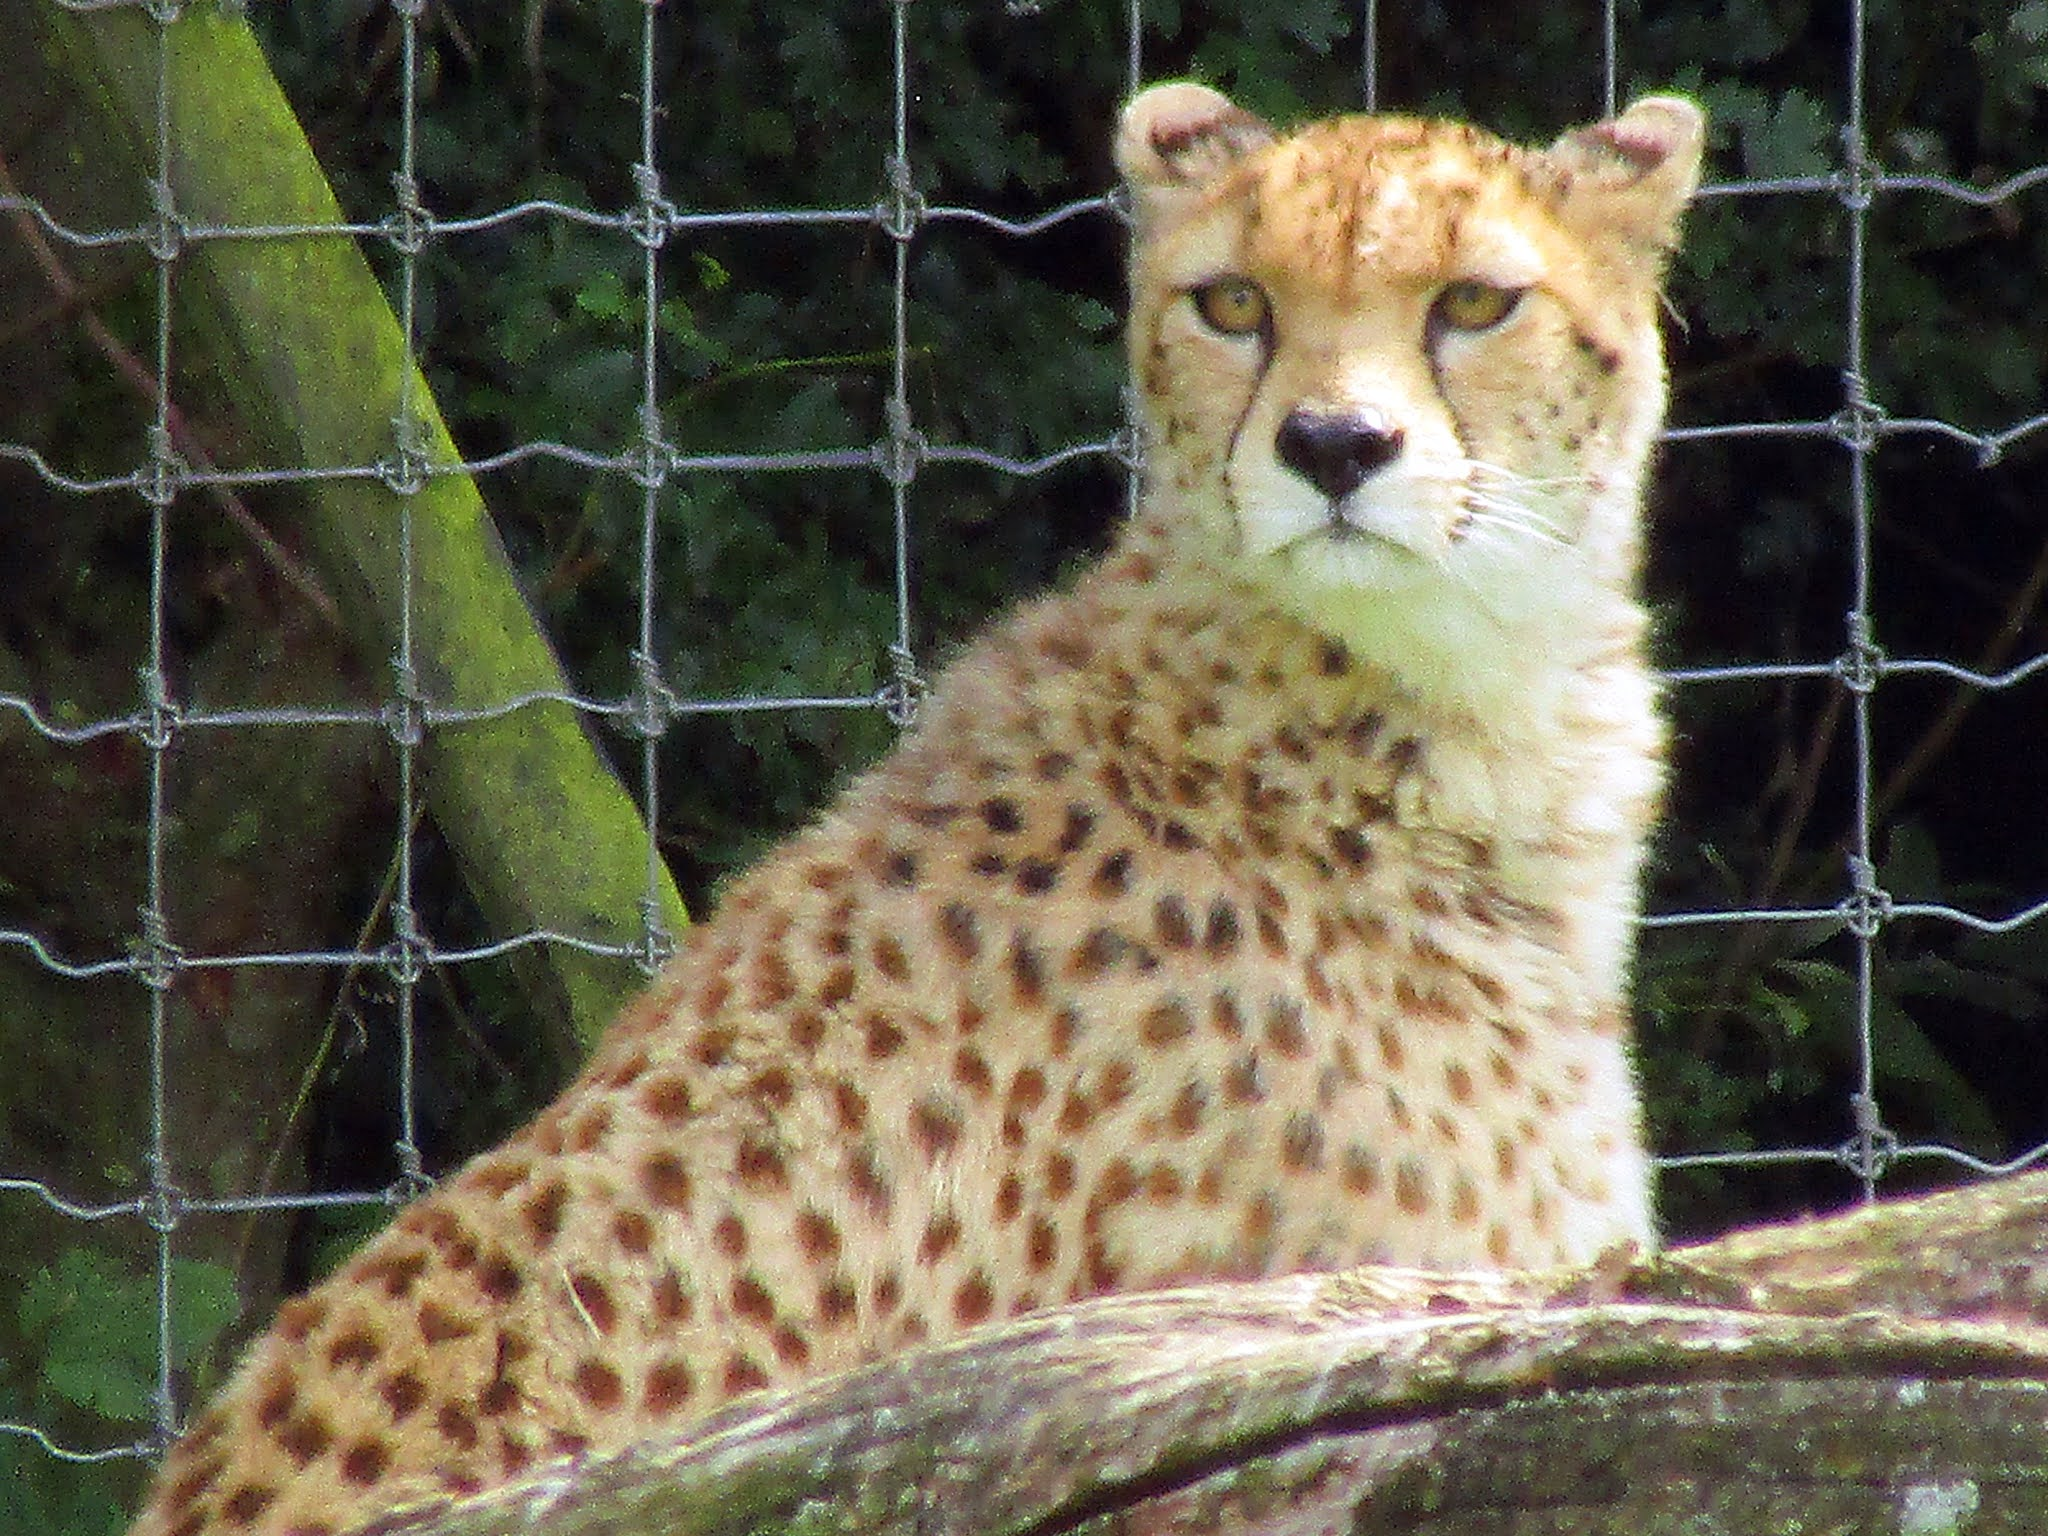 A photo of a cheetah at Whipsnade Zoo.